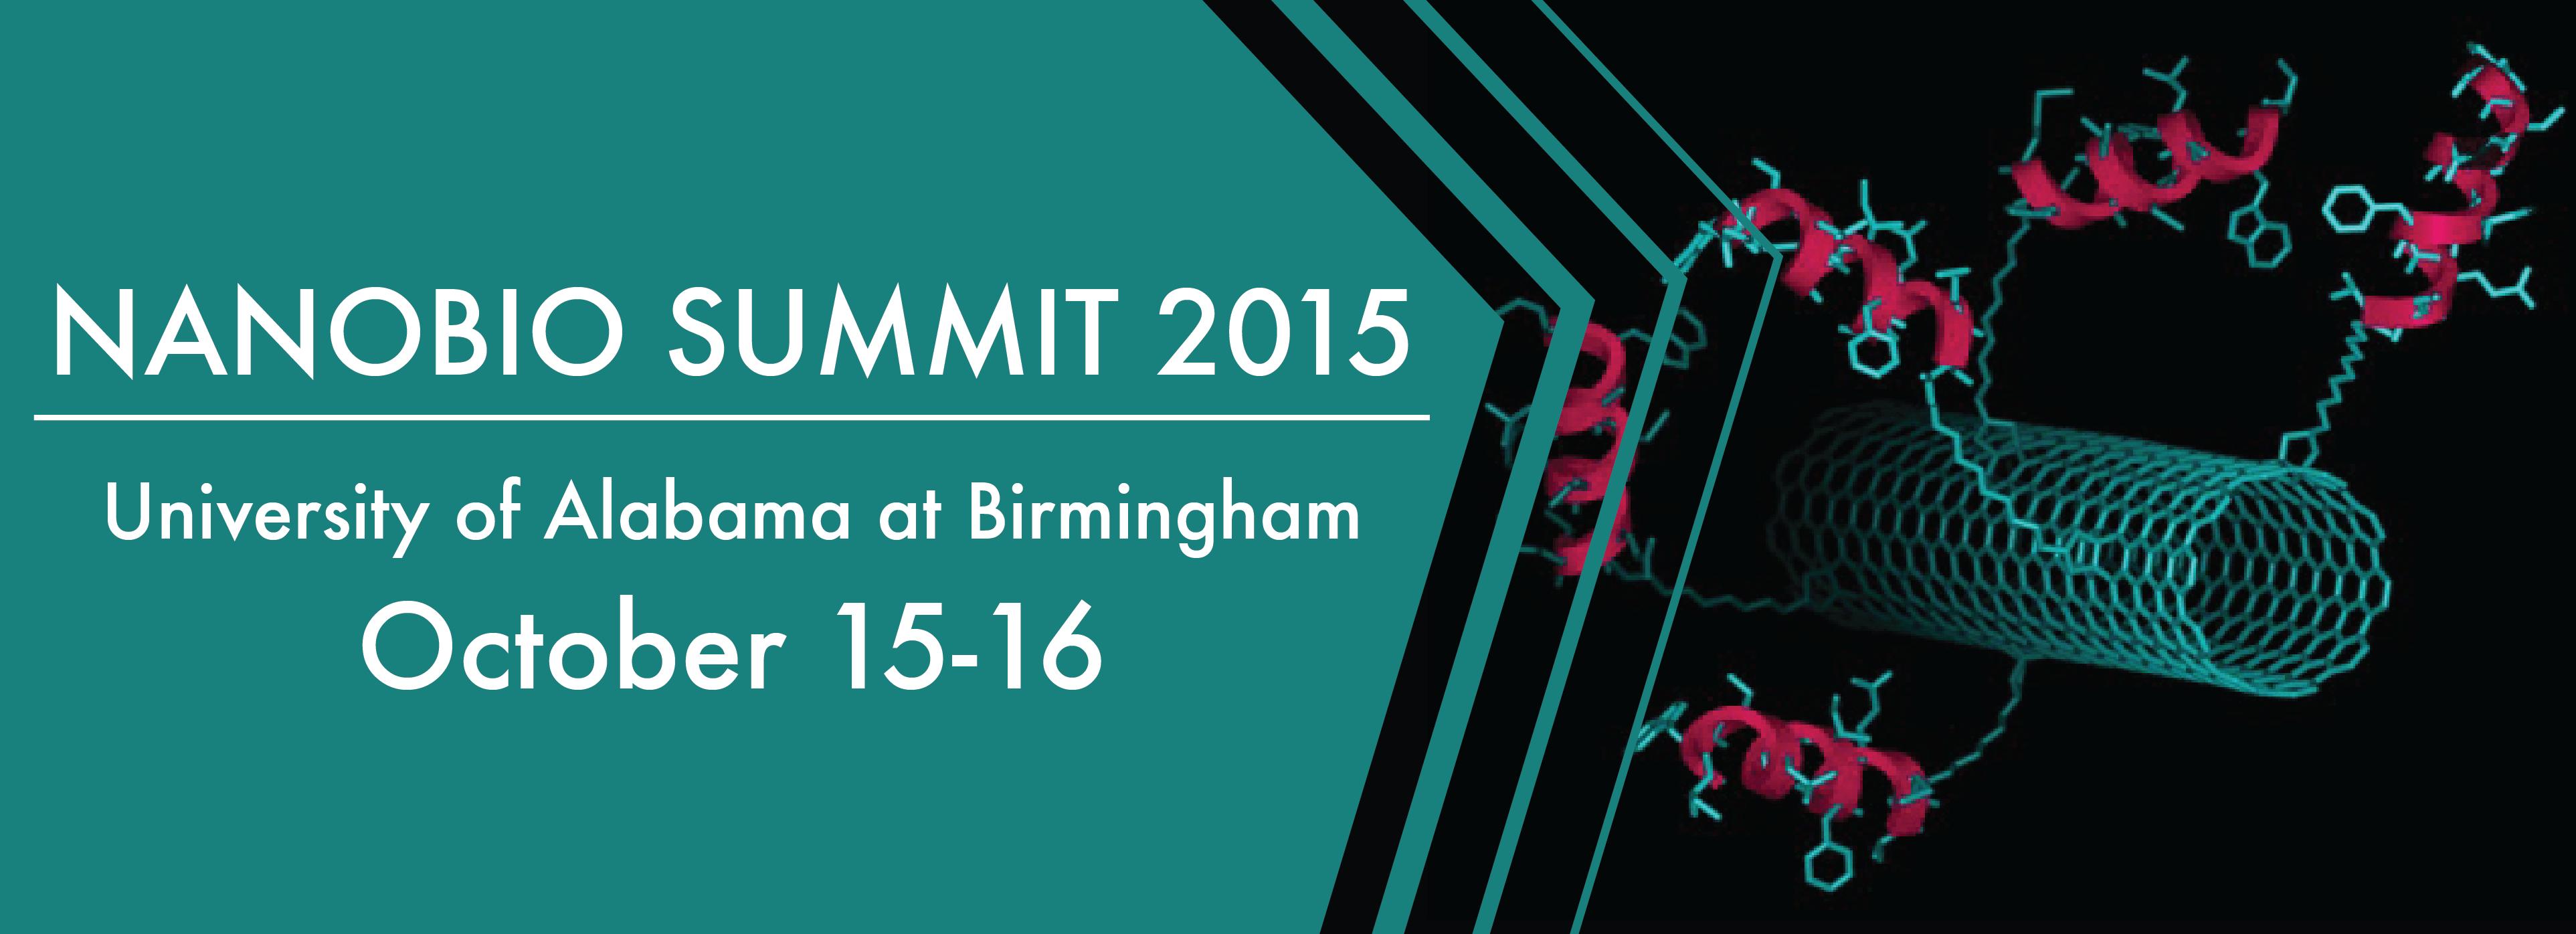 2015 NanoBio Summit